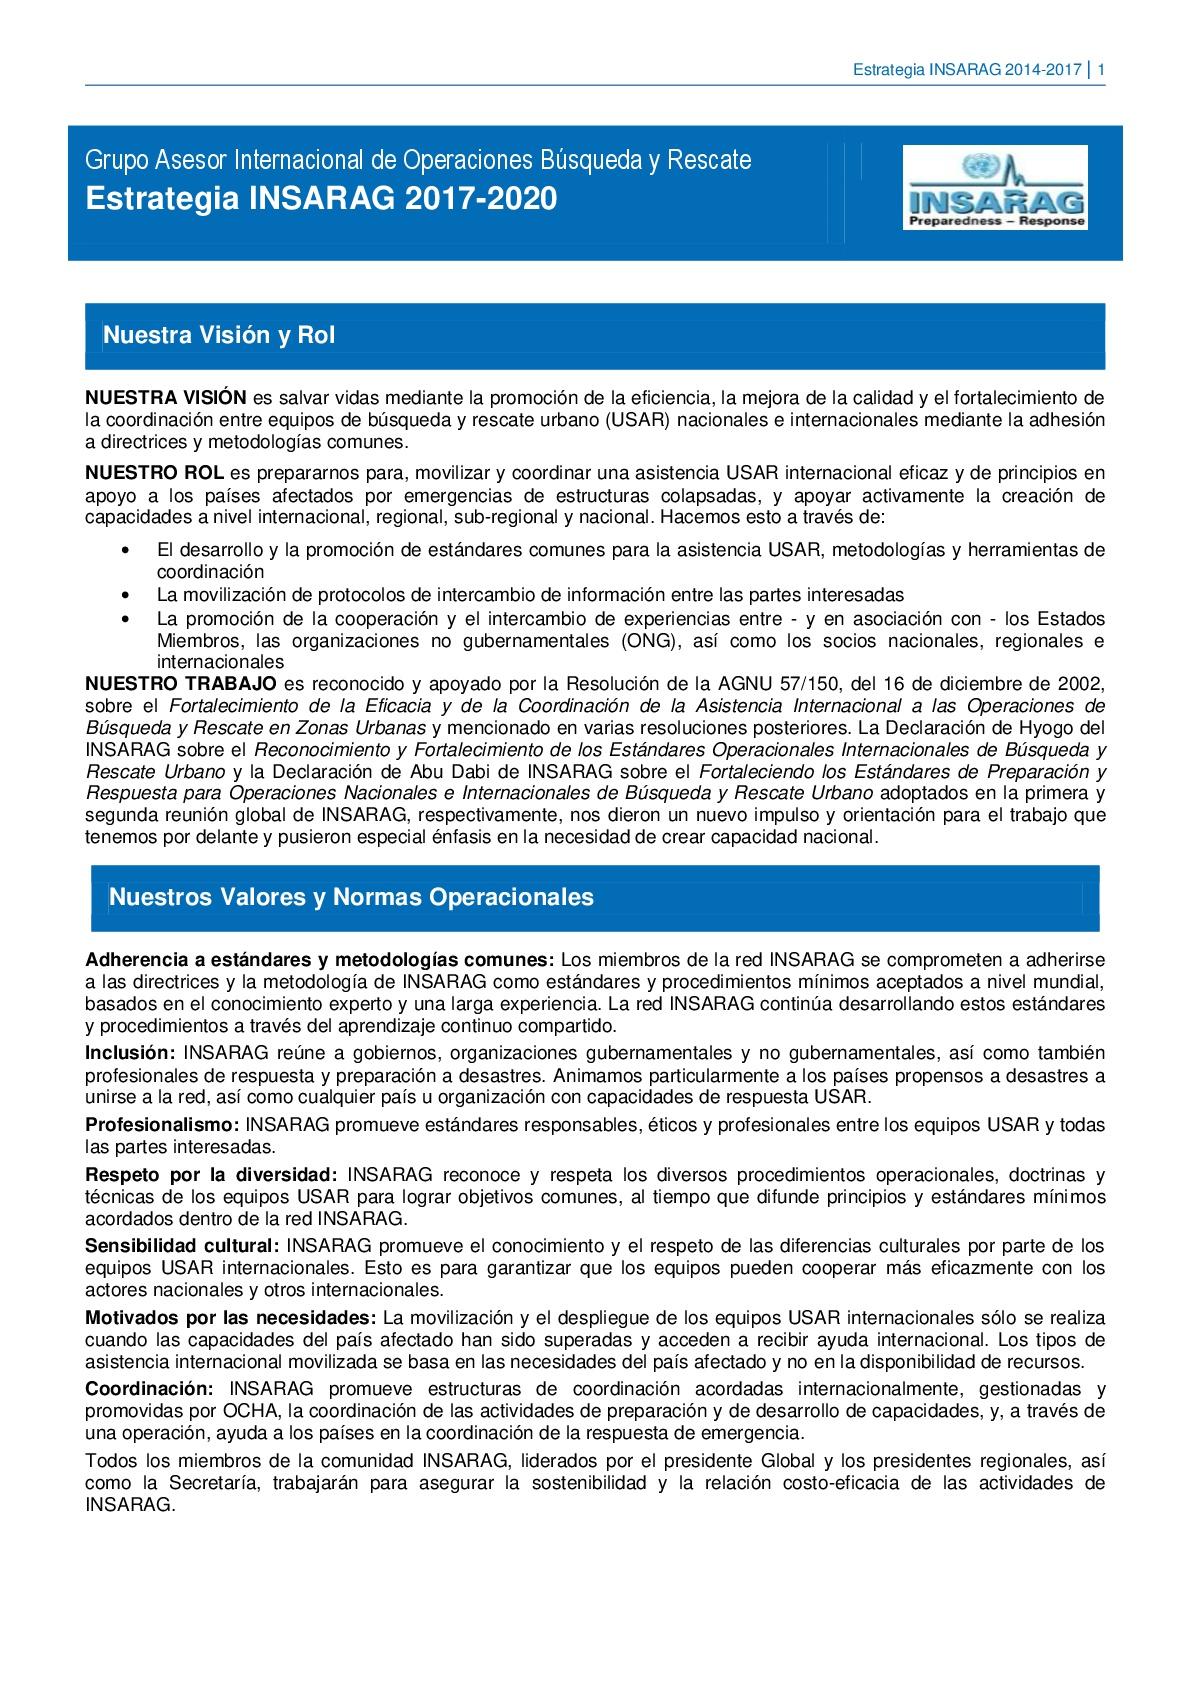 Final INSARAG Strategy 2017 2020 SPA 001